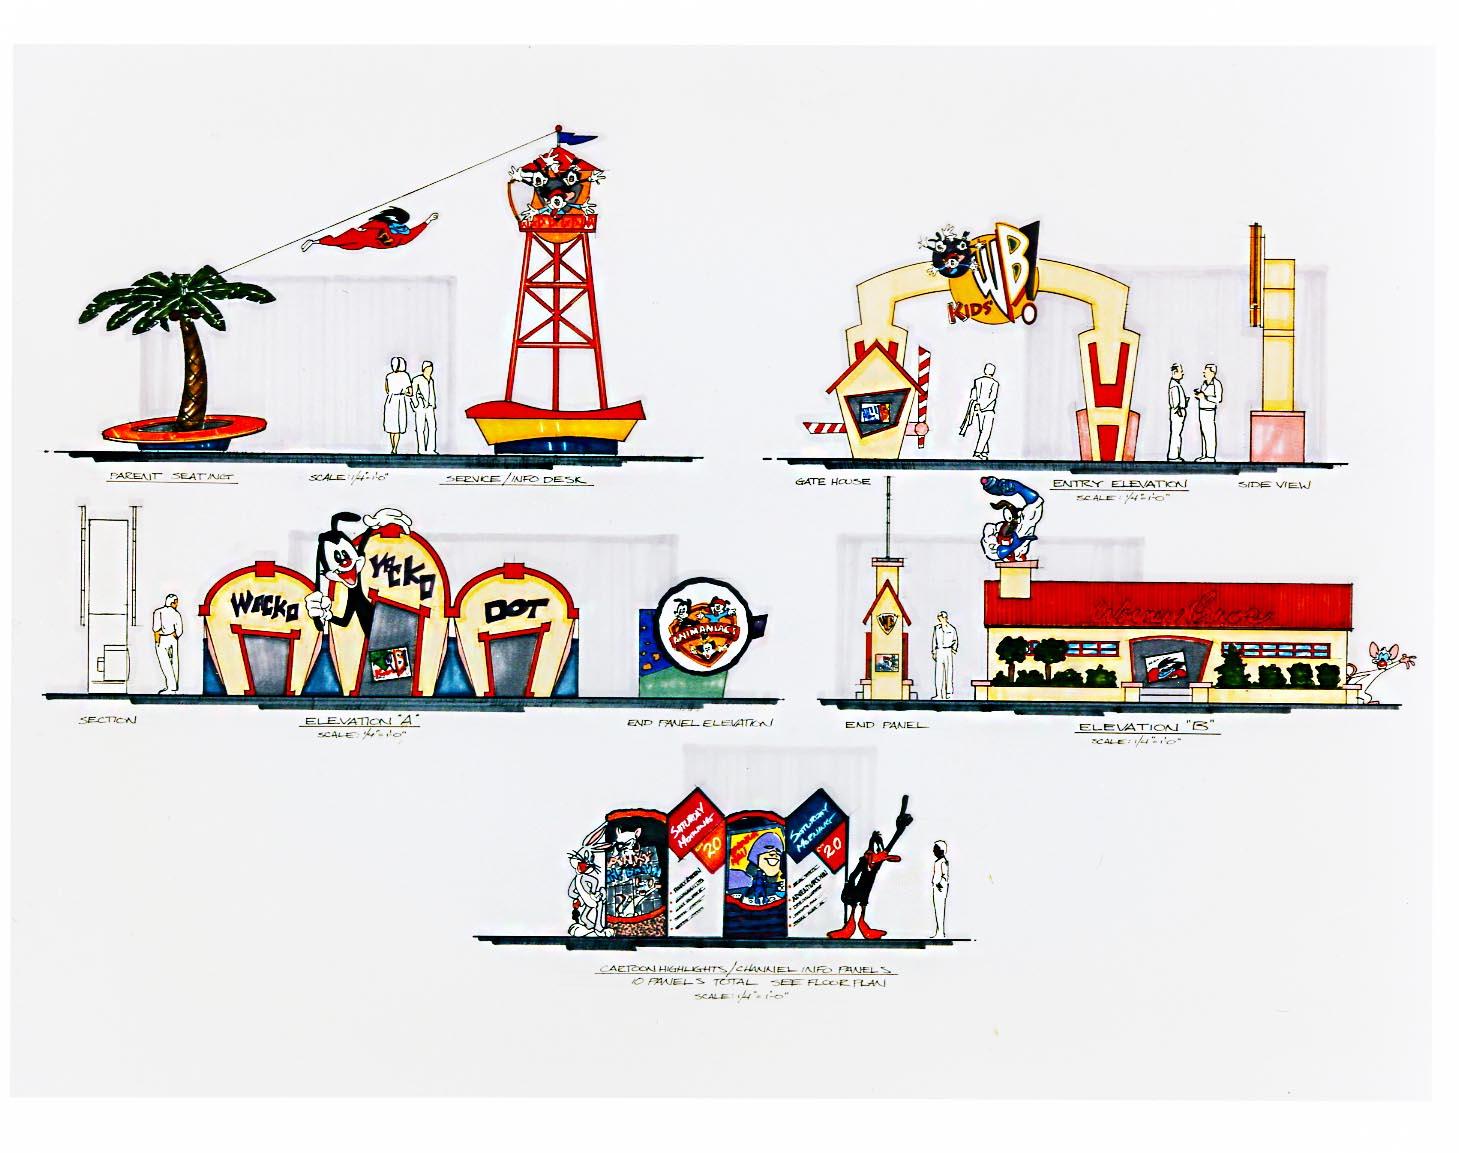 Warner Bros Exhibit Design Drawing